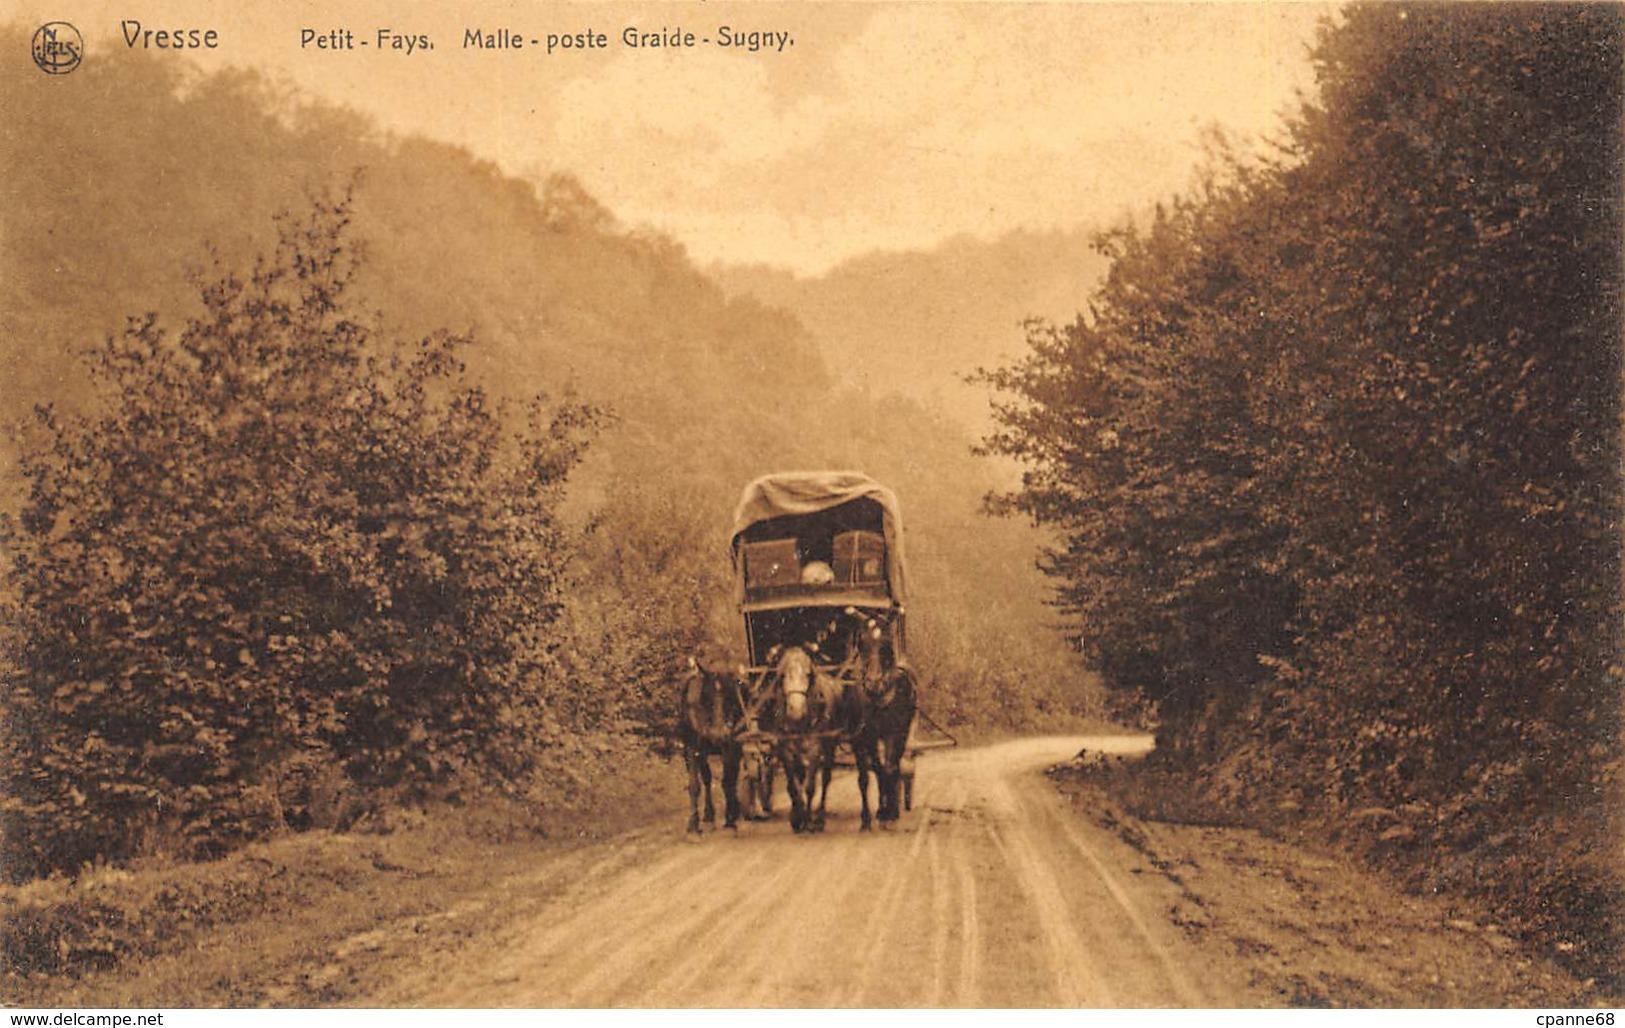 Vresse - Petit-Fays - Malle-Poste Graide-Sugny - Vresse-sur-Semois